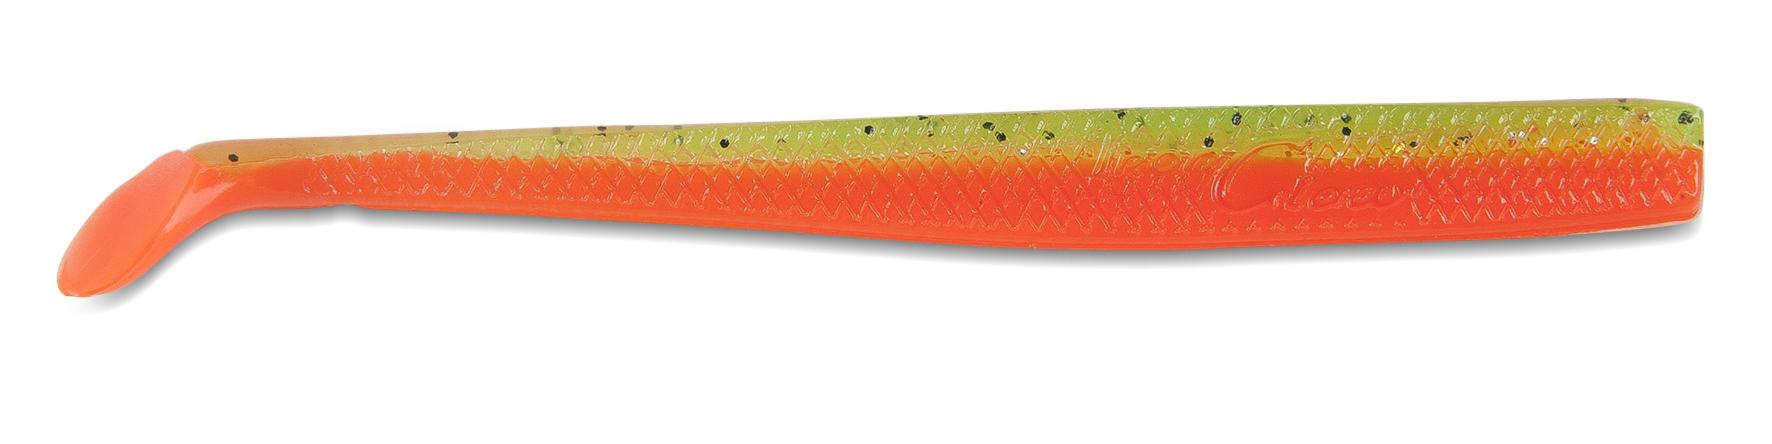 Iron Claw gumová nástraha Skinny Jake 11cm Vzor OB, 3ks